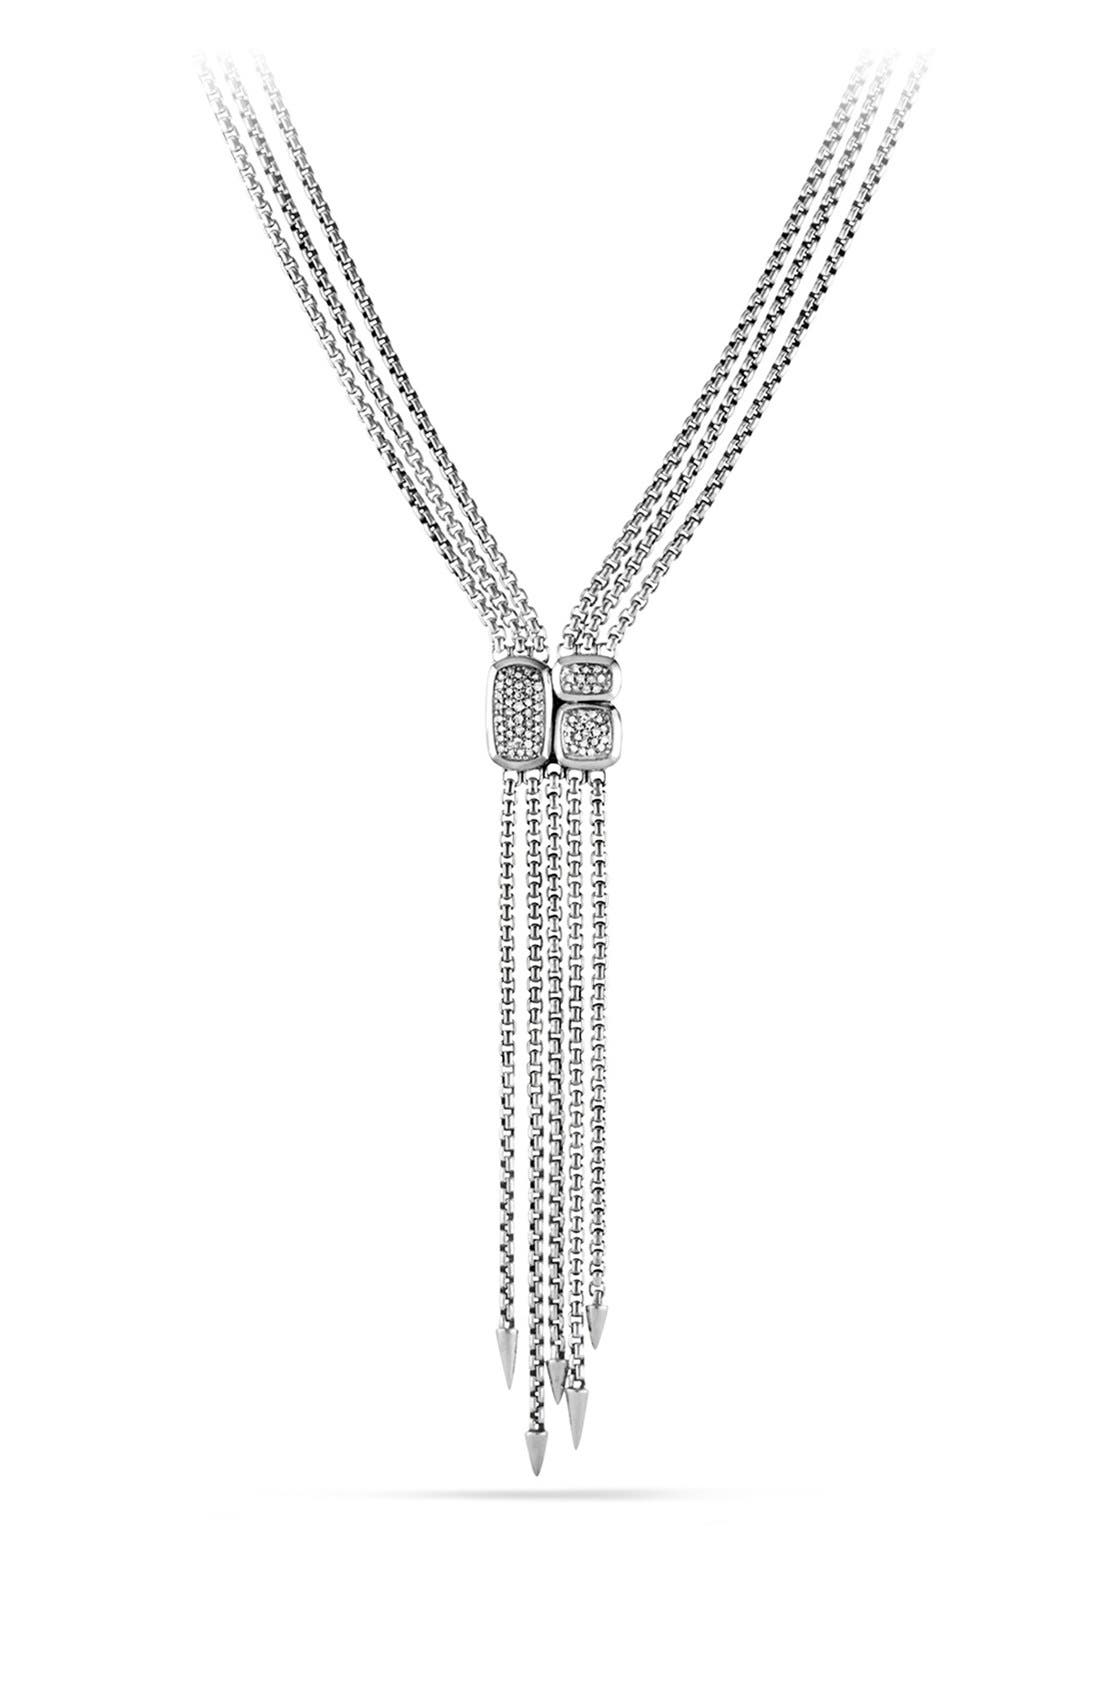 Main Image - David Yurman 'Confetti' Drop Necklace with Diamonds